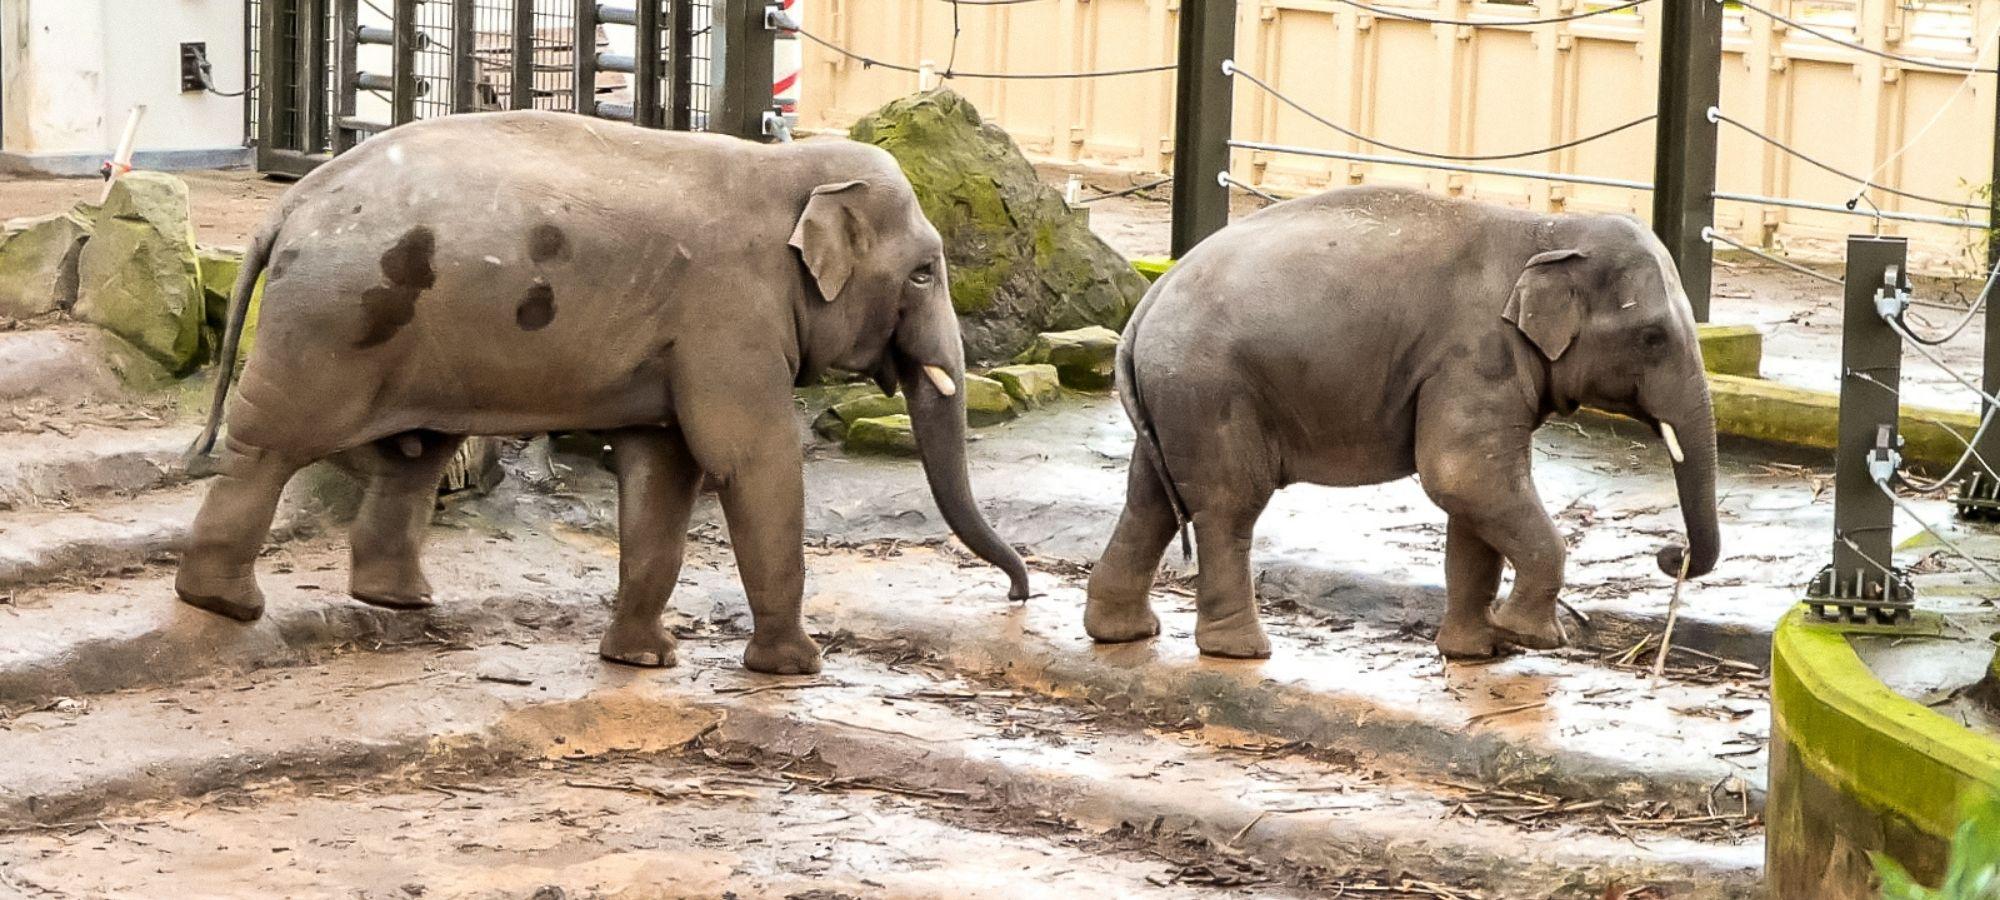 Two elephants in a zoo animal enclosure at Planckendael Zoo, Belgium